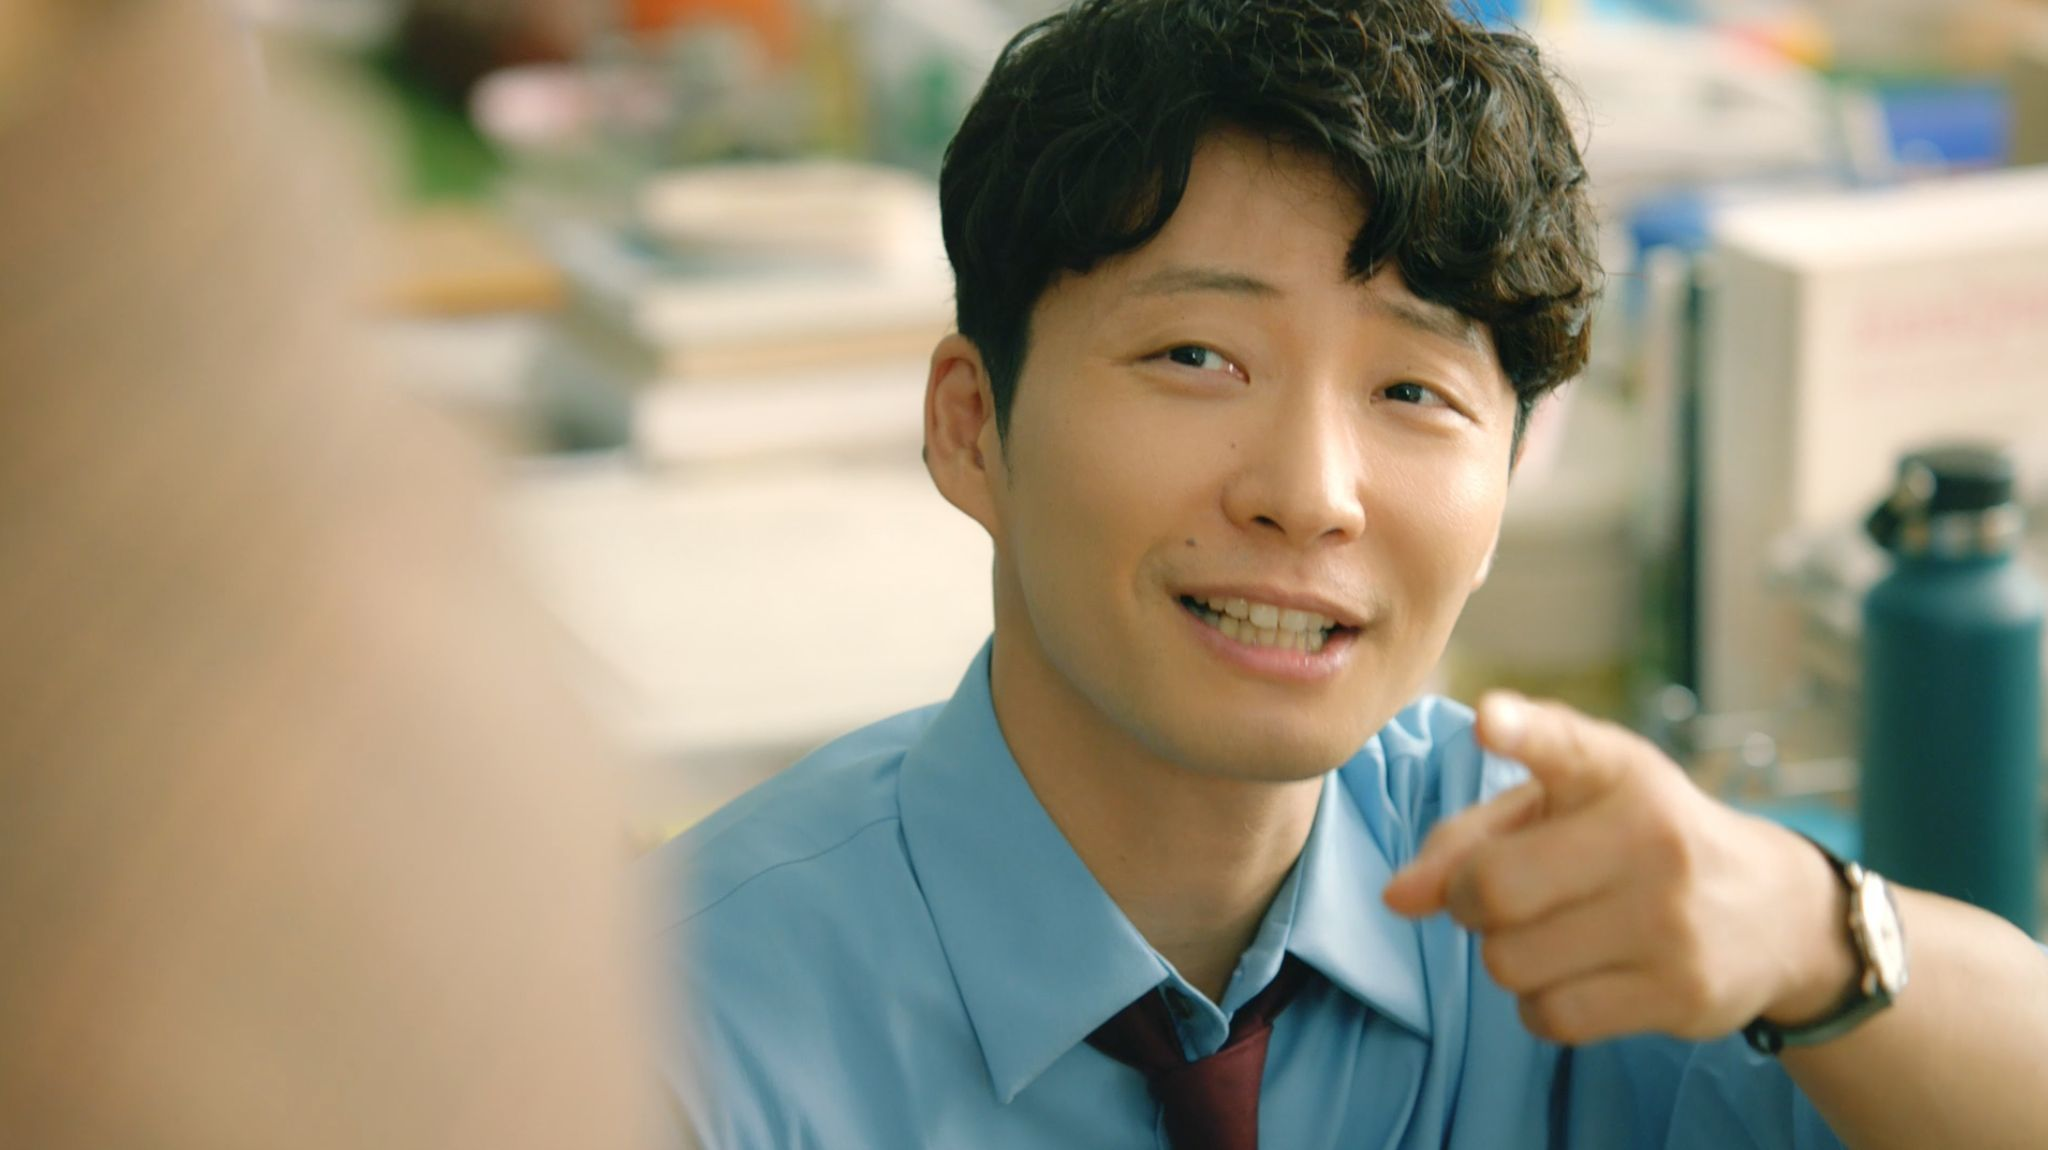 NTTドコモTVCM「先生、5Gって知ってる?」篇 (15秒、30秒)